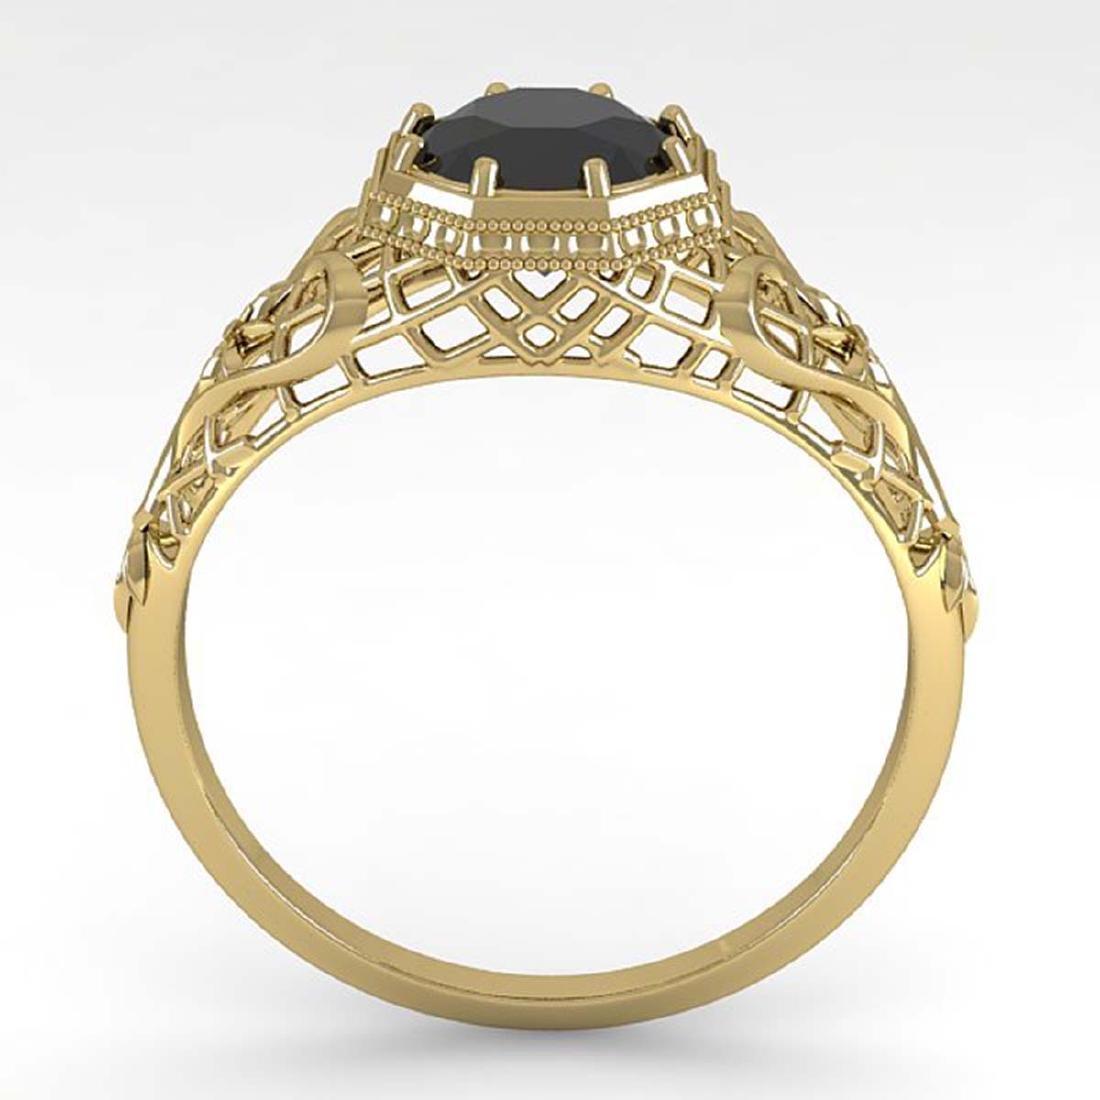 1.0 CTW Black Certified Diamond Ring Art Deco 14K - 3